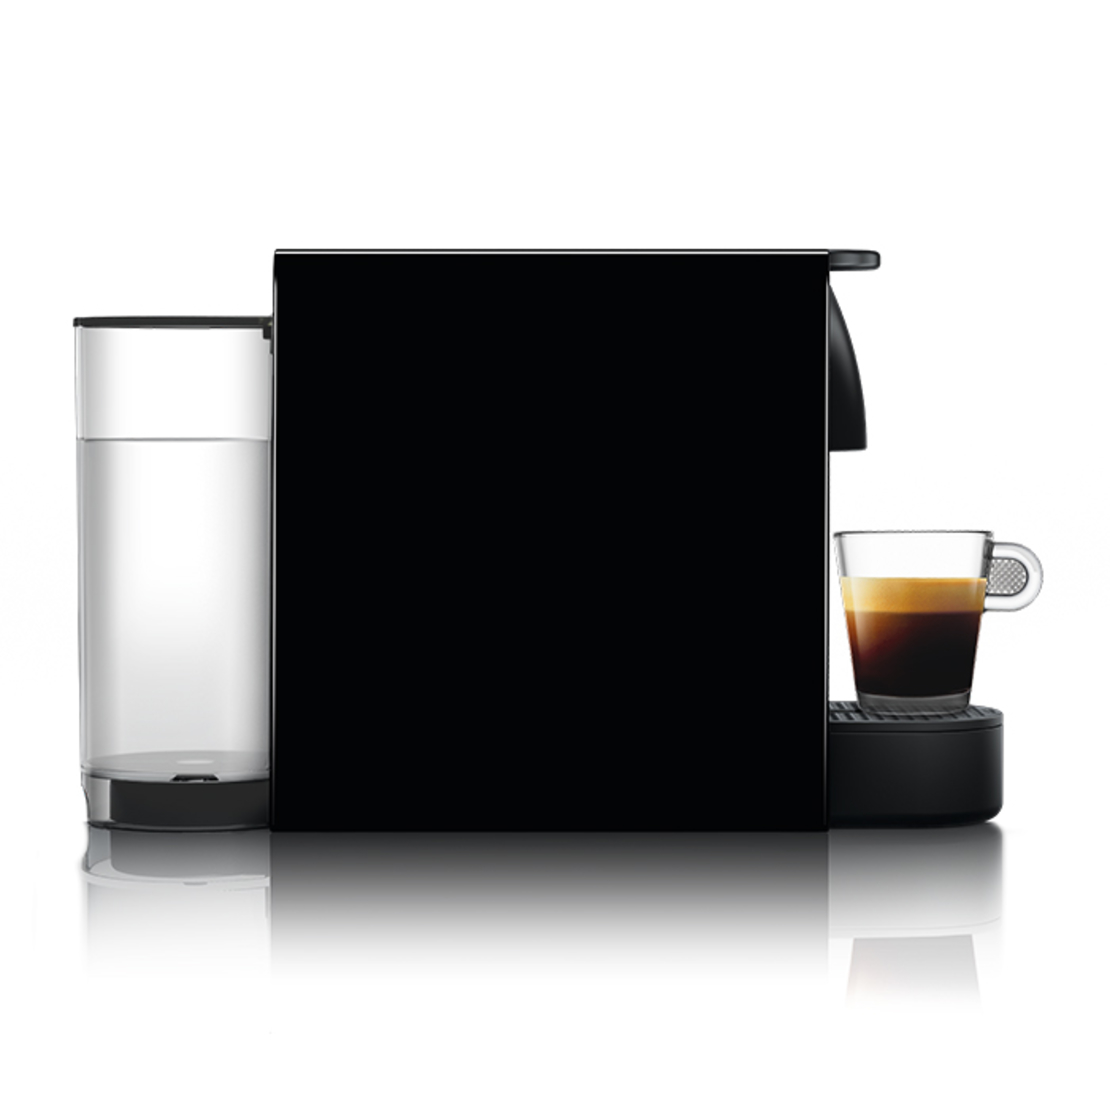 Nespresso Essenza C30 מכונת קפה אסנזה מיני